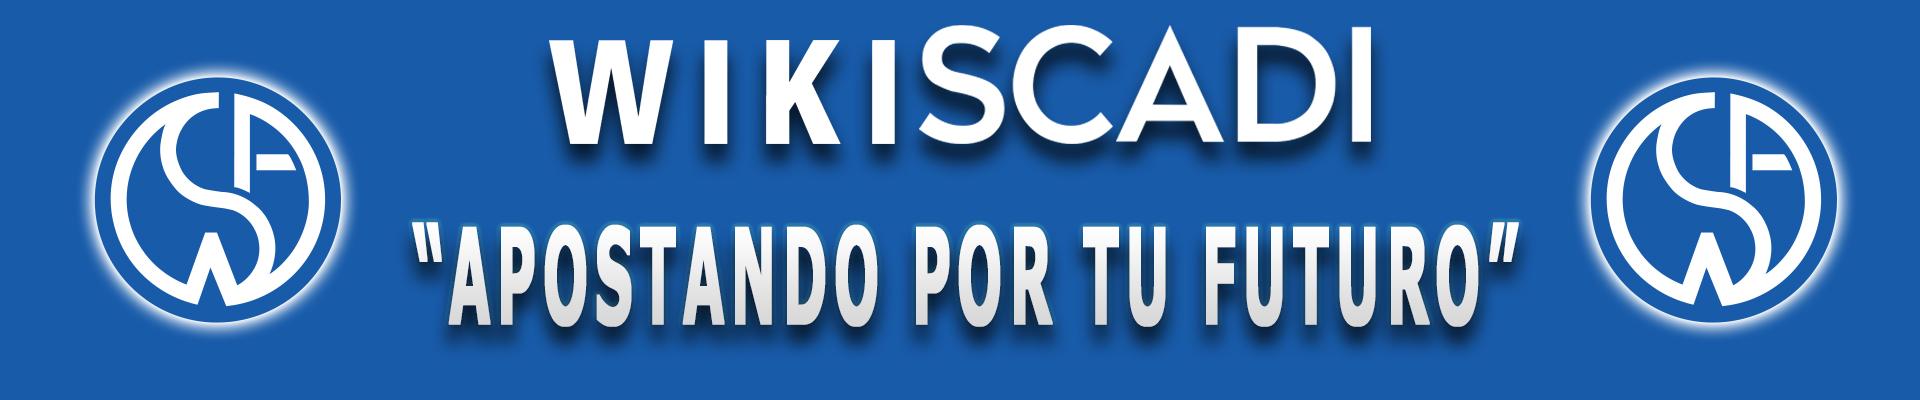 Wikiscadi – Apostando por tu futuro